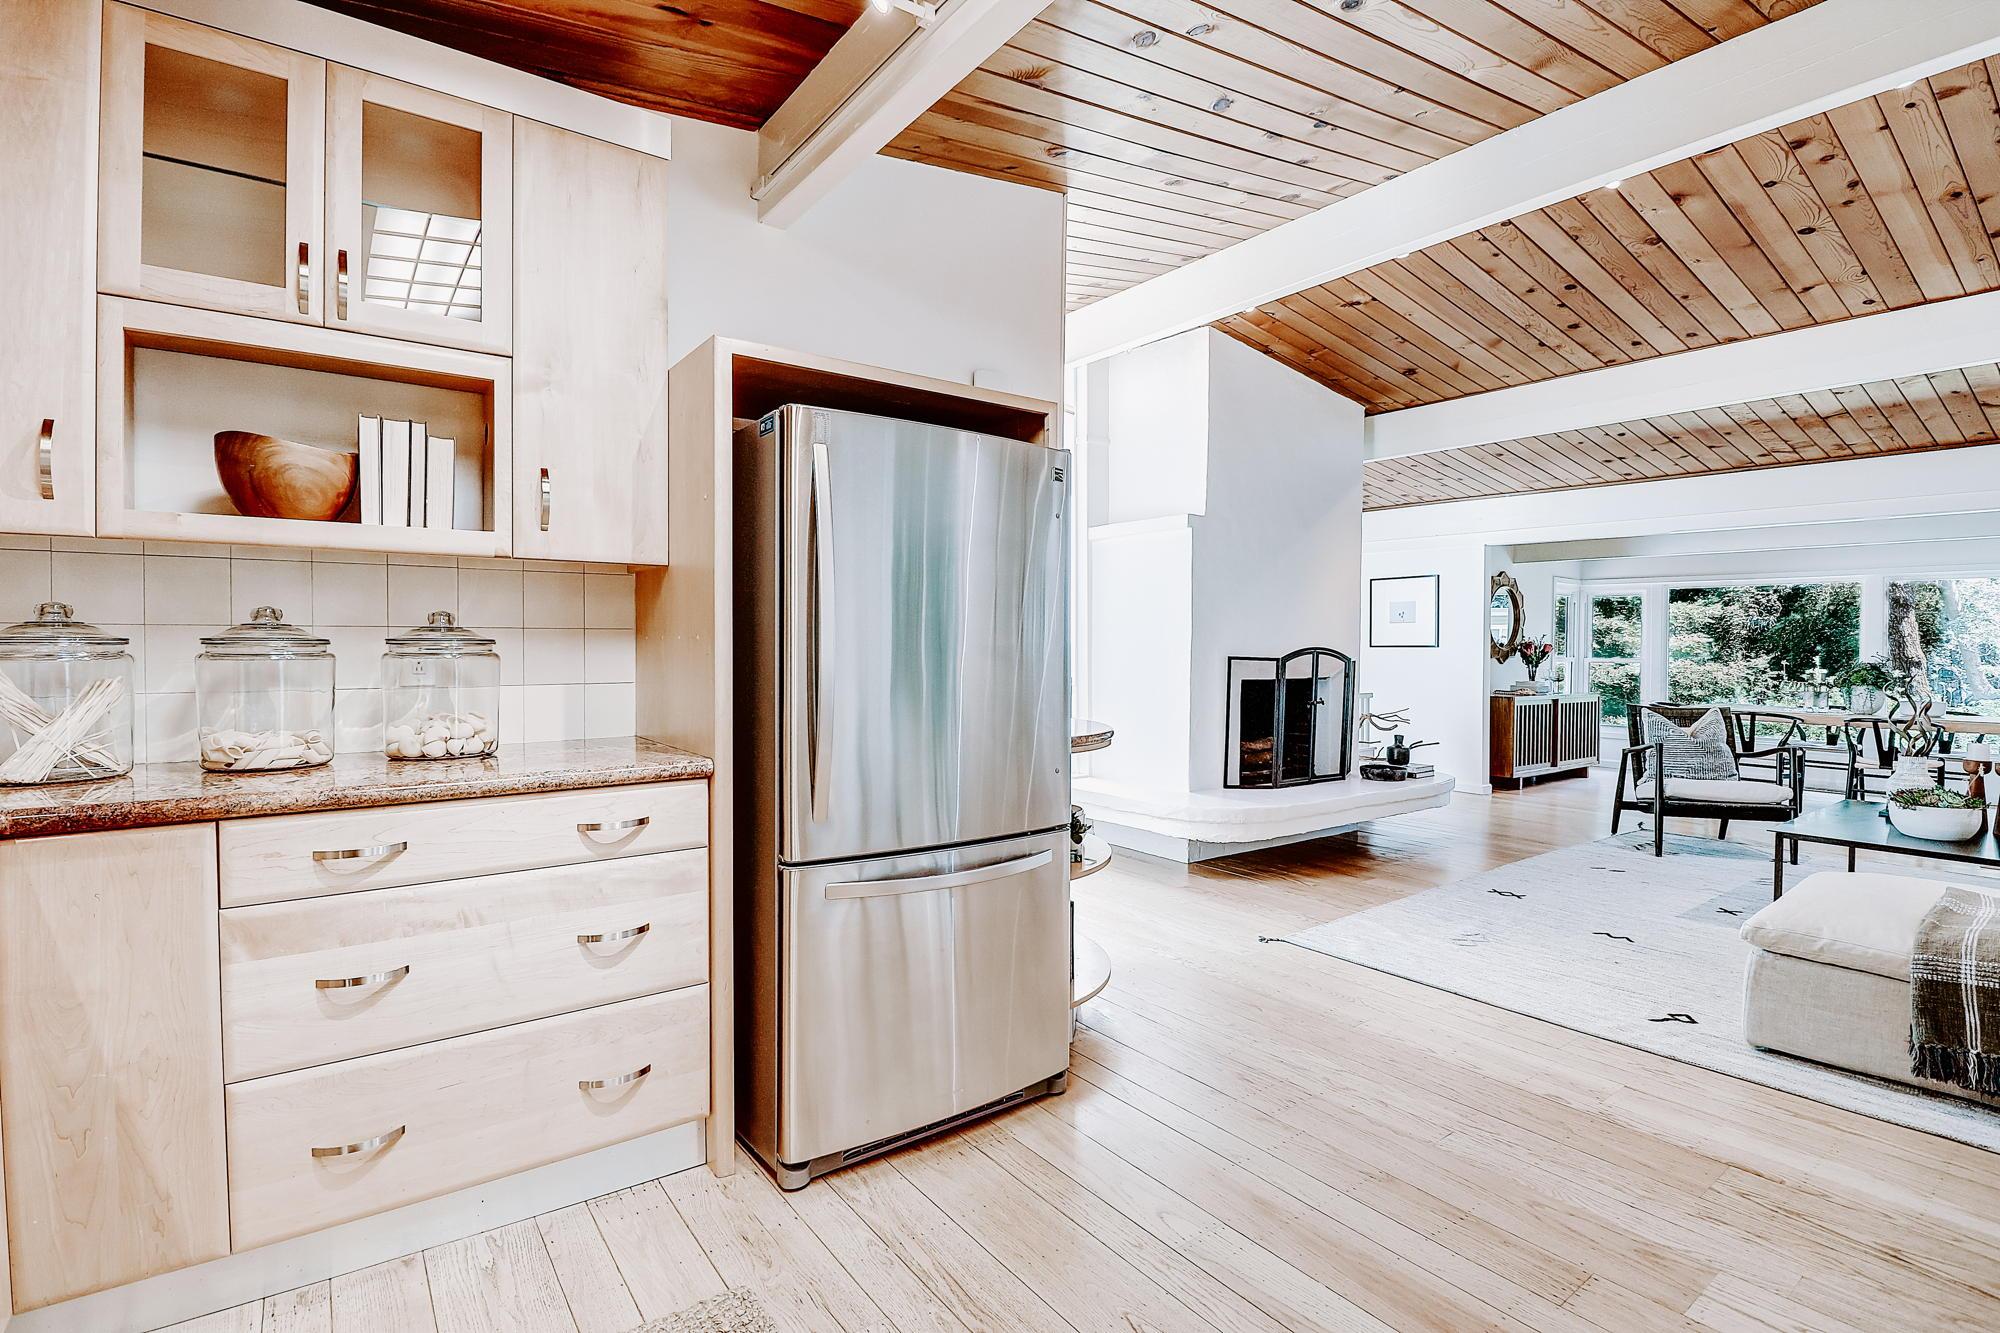 360 Corte Madera Avenue,  Marin County Top Realtor -23- Own Marin at Compass.jpg